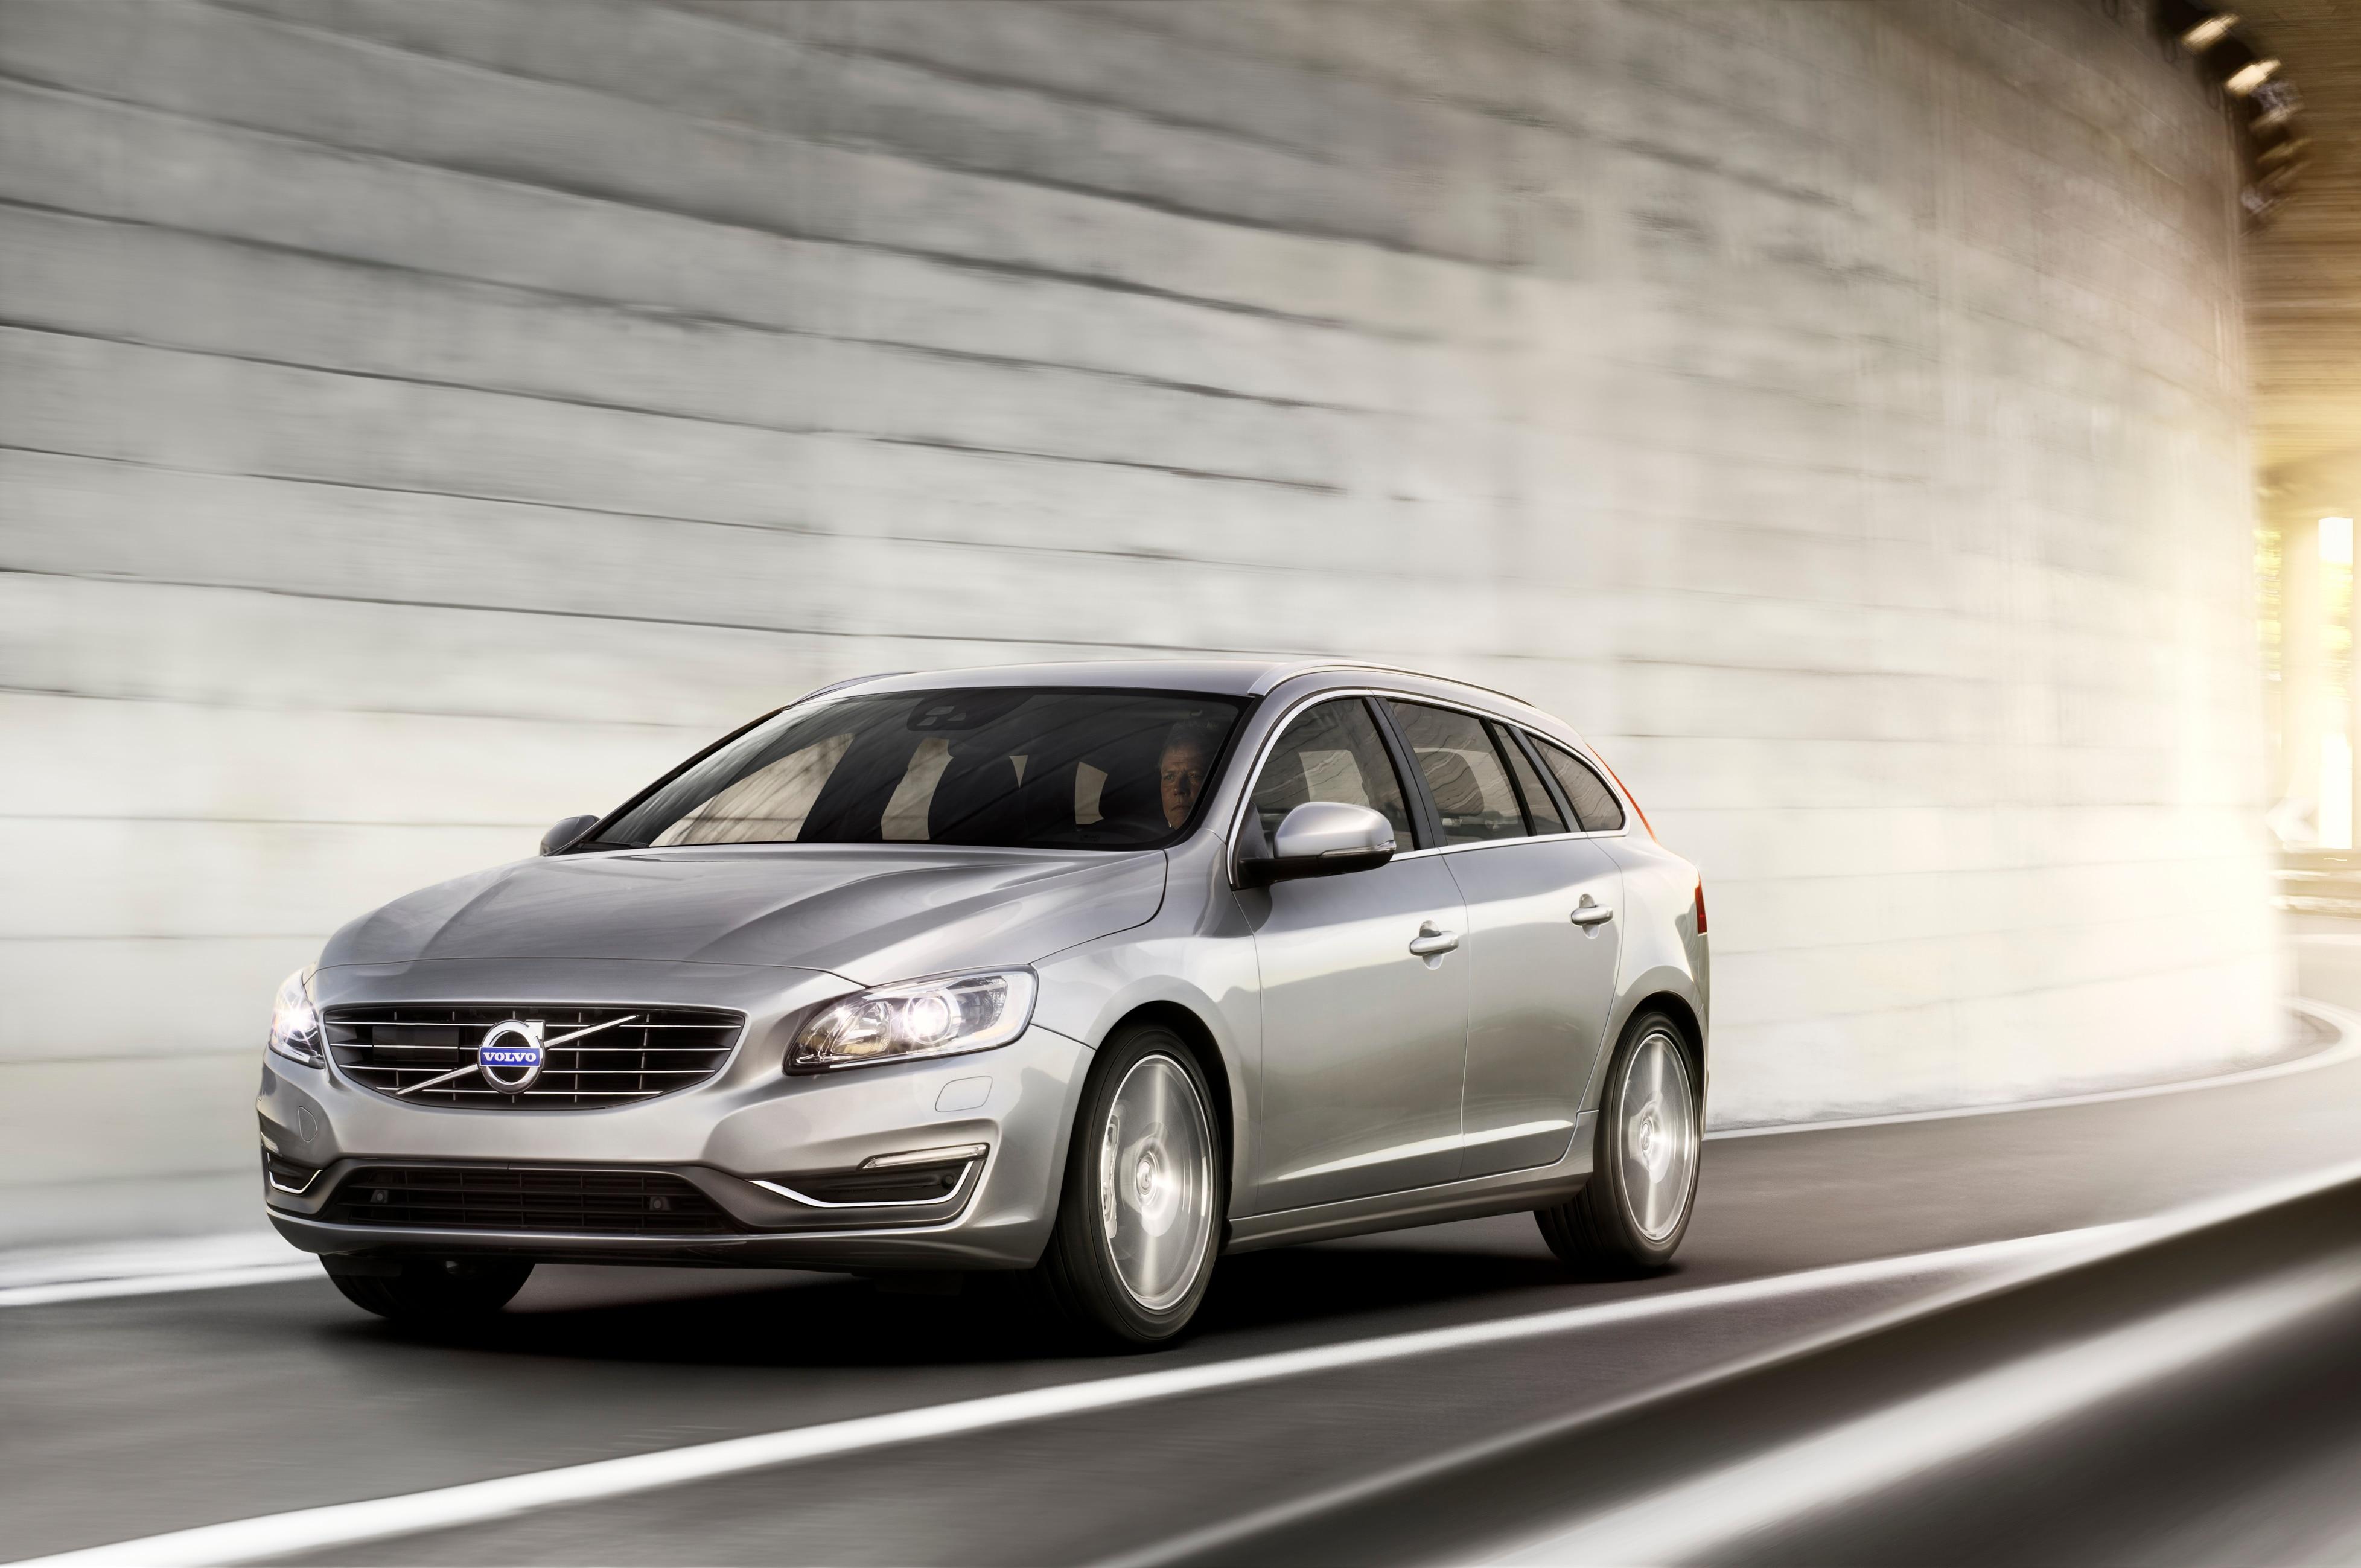 2015 Volvo V60 Front Three Quarter1